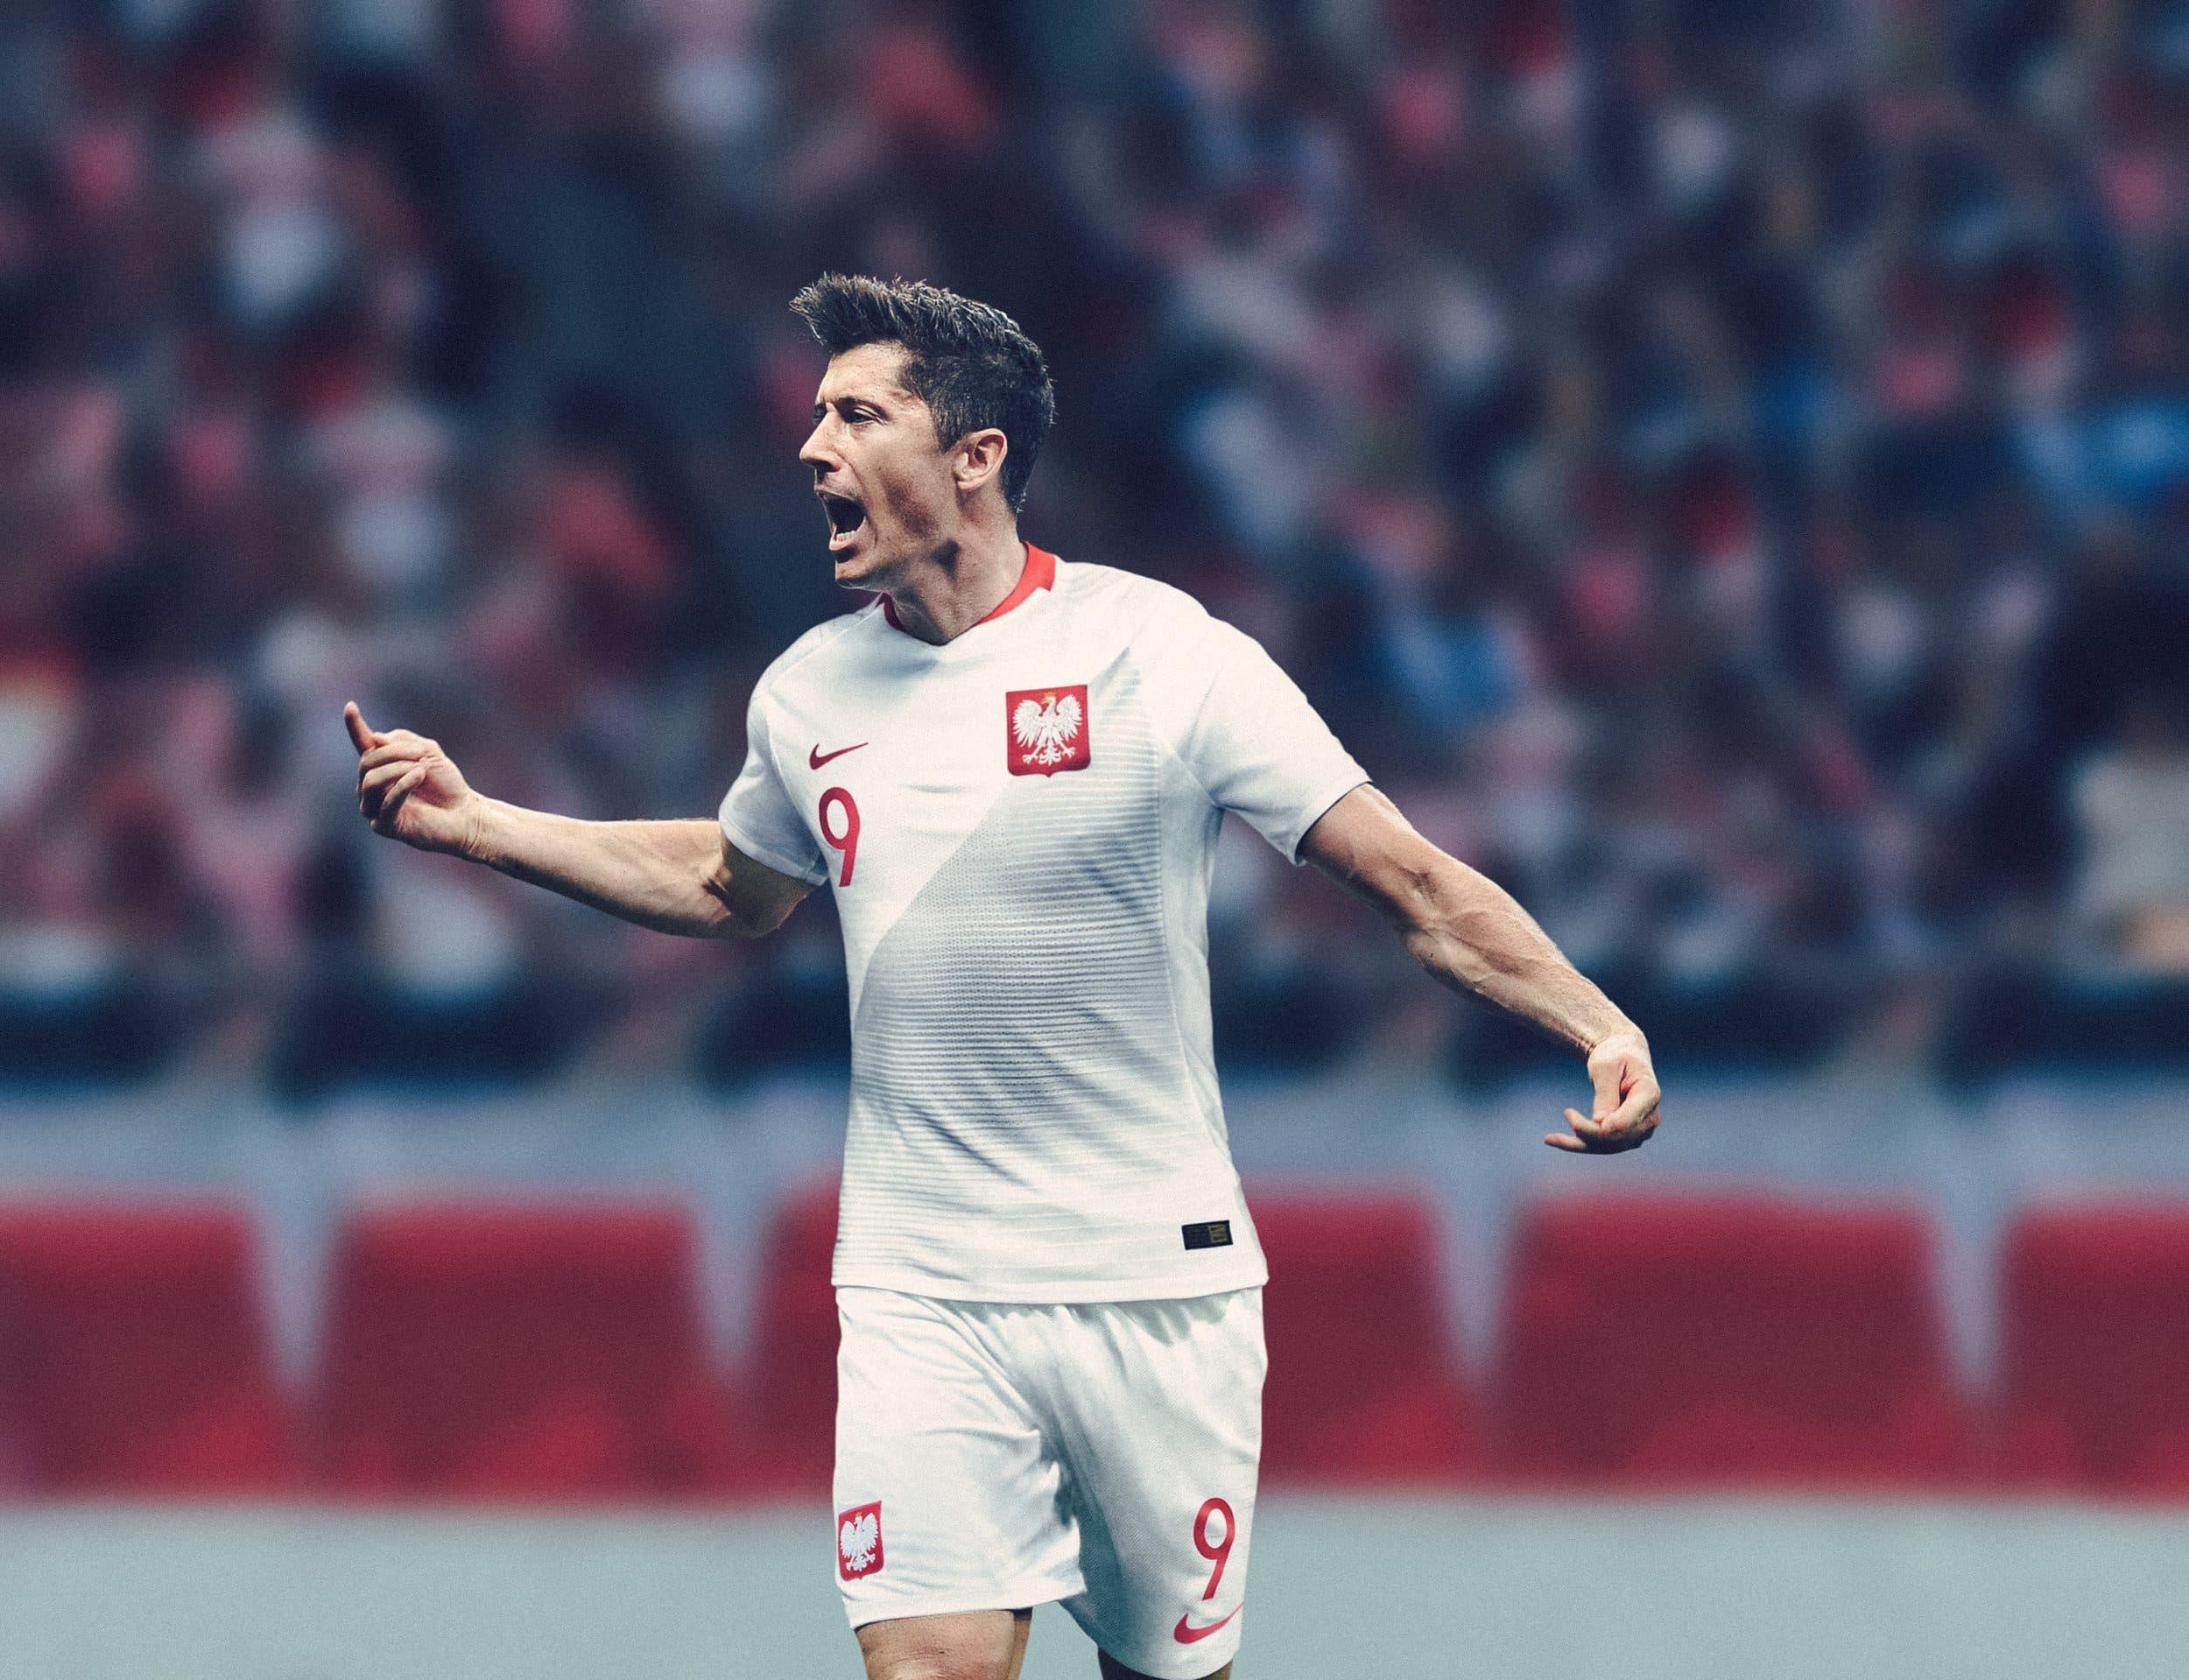 maillot-football-Nike-Pologne-domicile-2018-img4.jpg